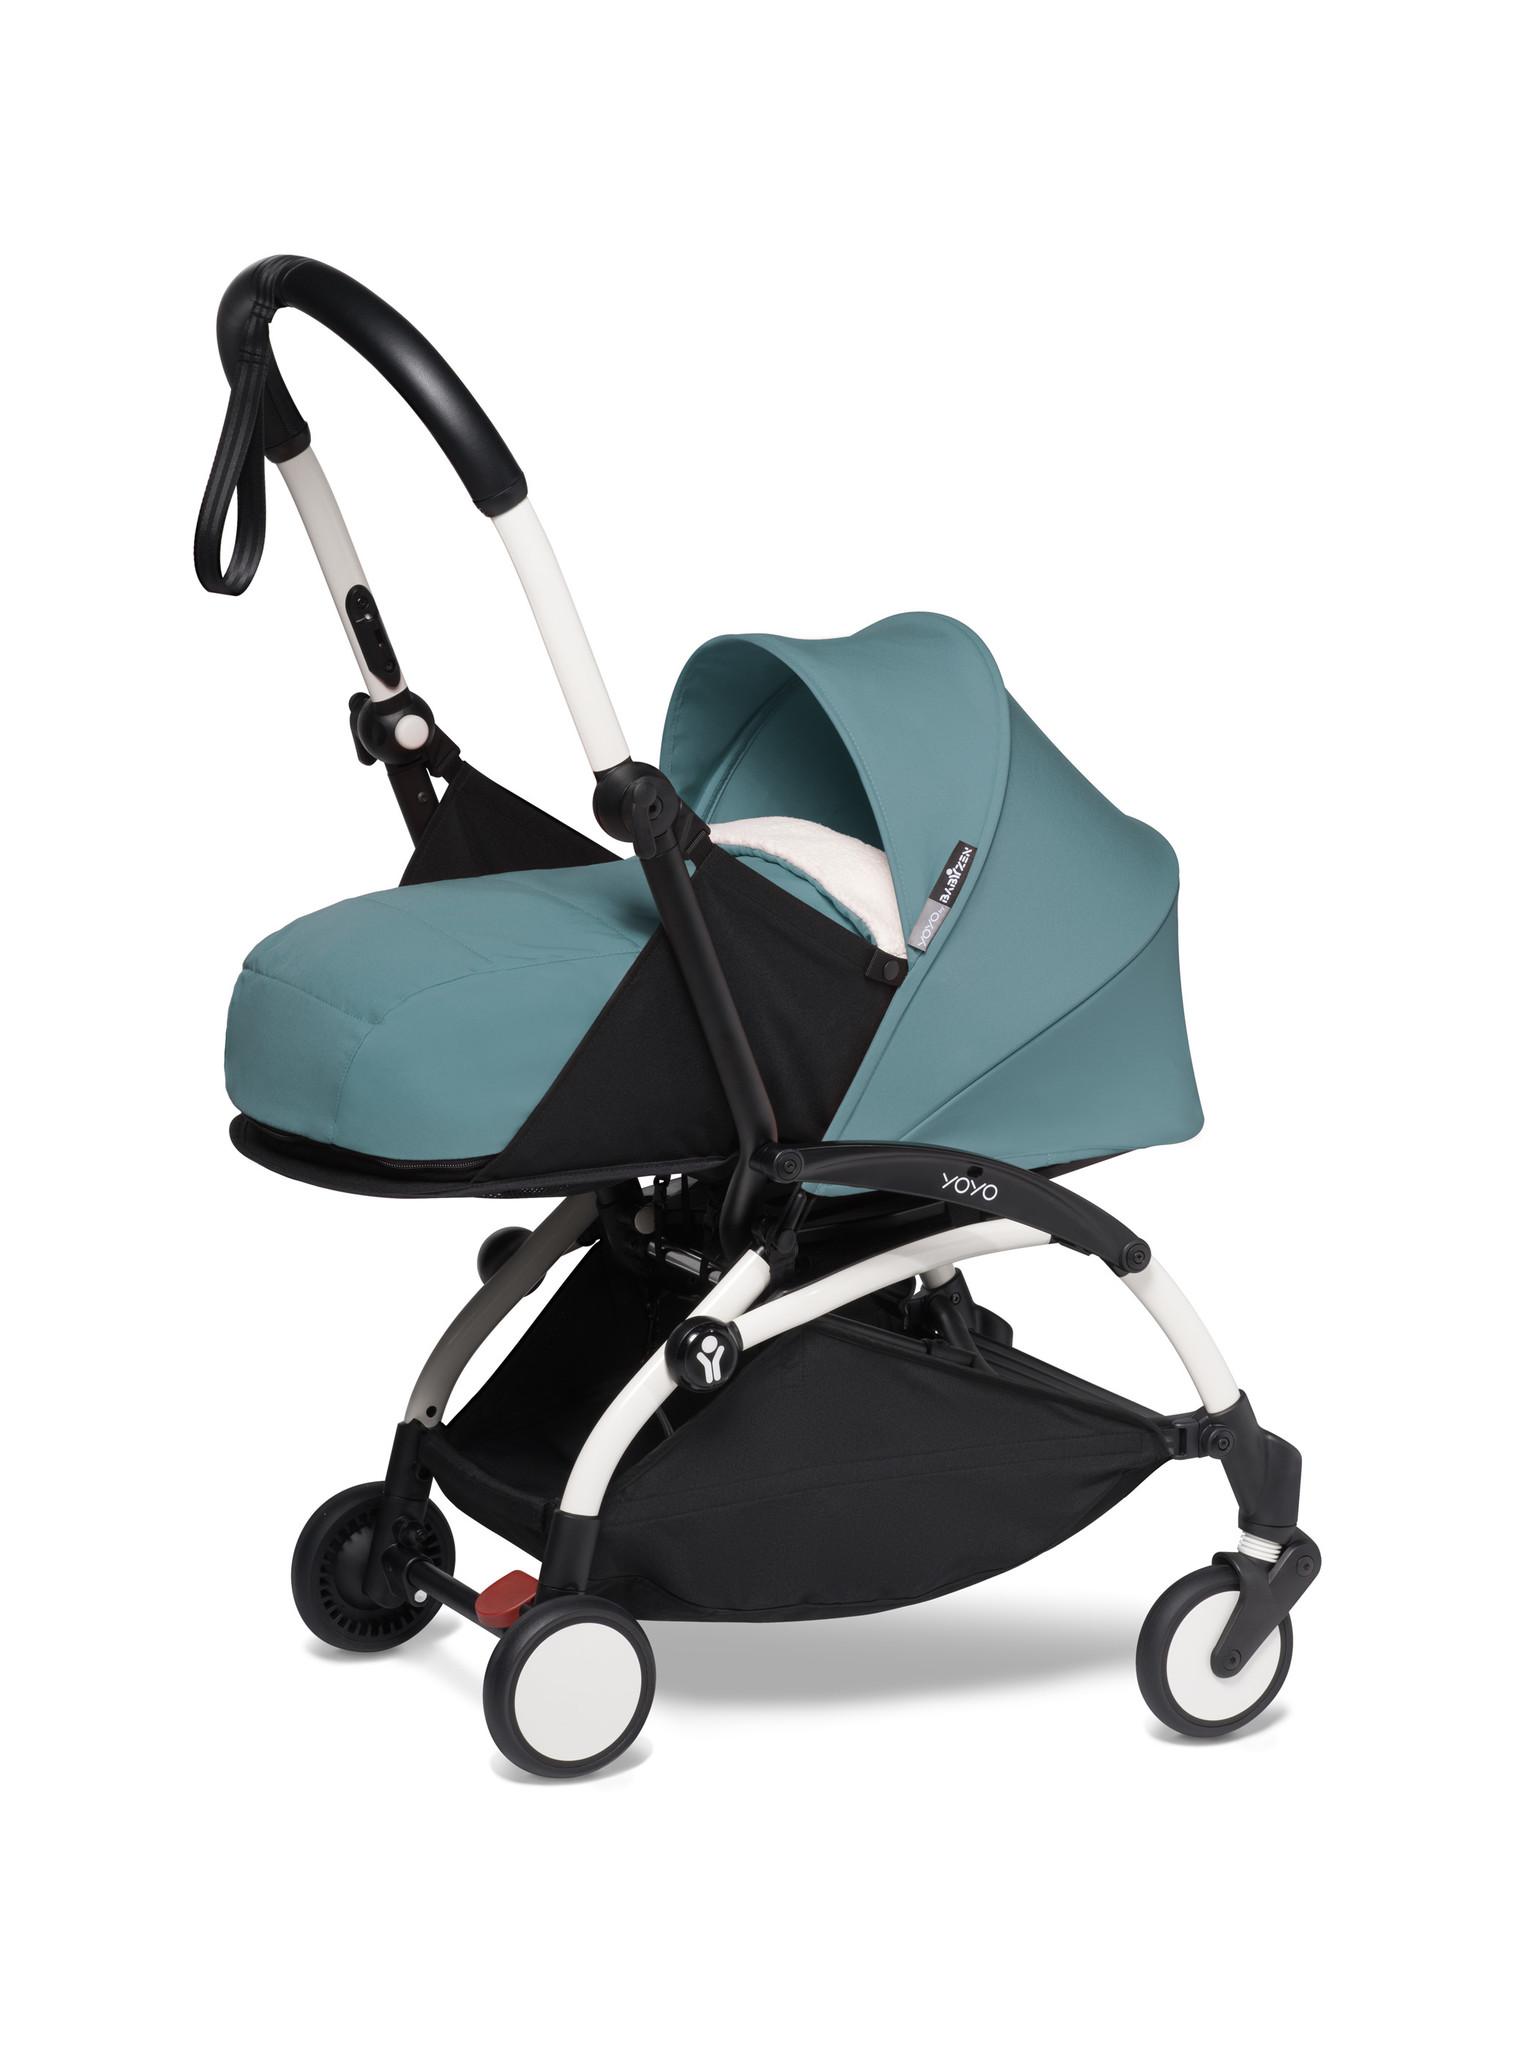 Babyzen Babyzen YOYO² buggy COMPLEET / FULL SET 0+ and 6+ aqua frame wit incl. YOYO² BeSafe autostoel zwart